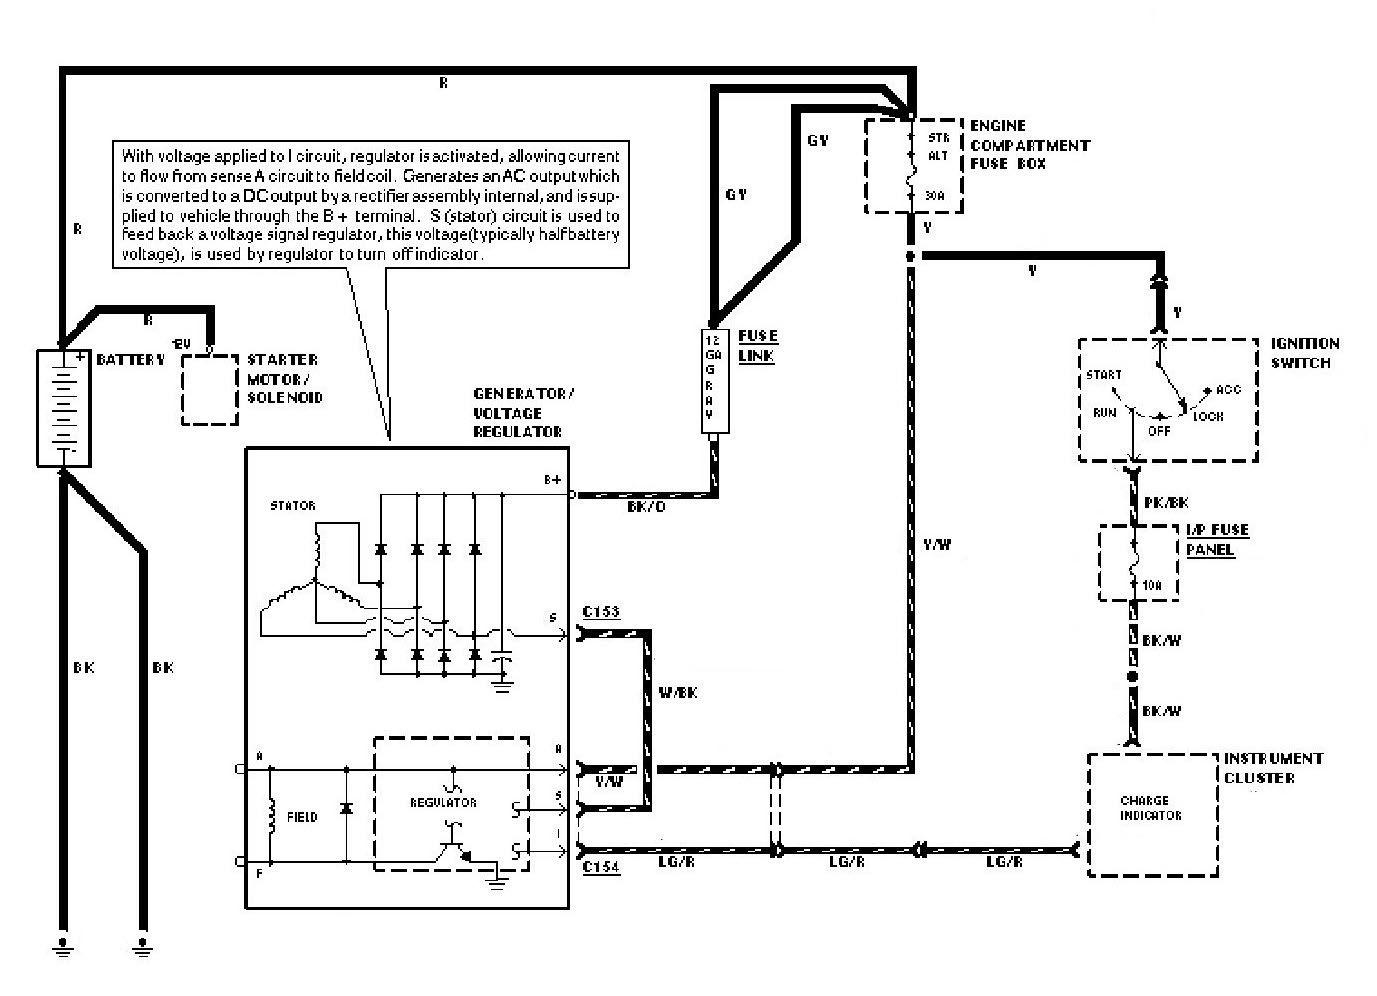 Wiring Diagram Internal Regulator Alternator (With images